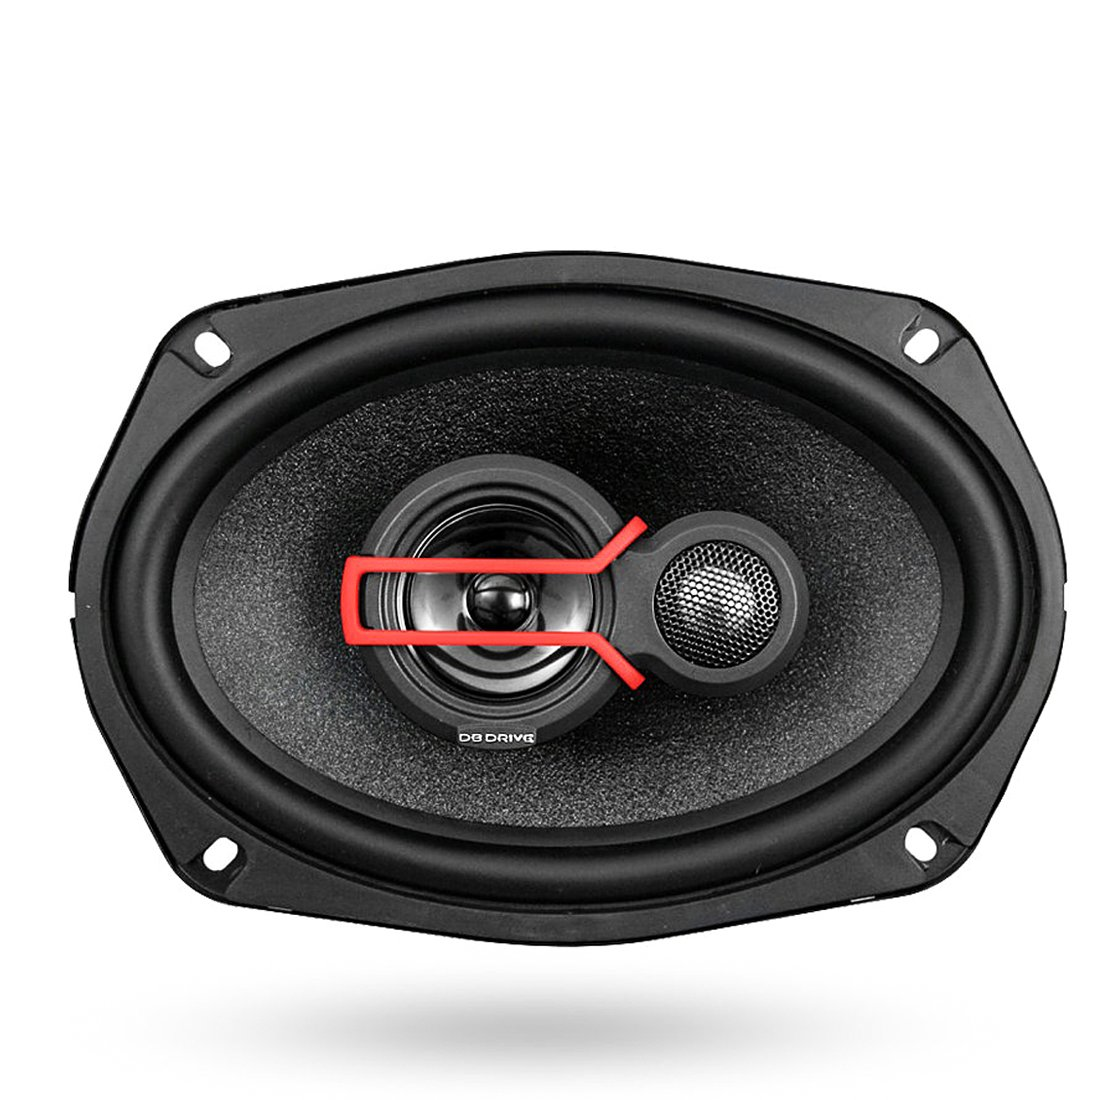 DB Drive Okur Series 500W 6'' x 9'' 3-Way Stereo High Powered Car Audio Speakers